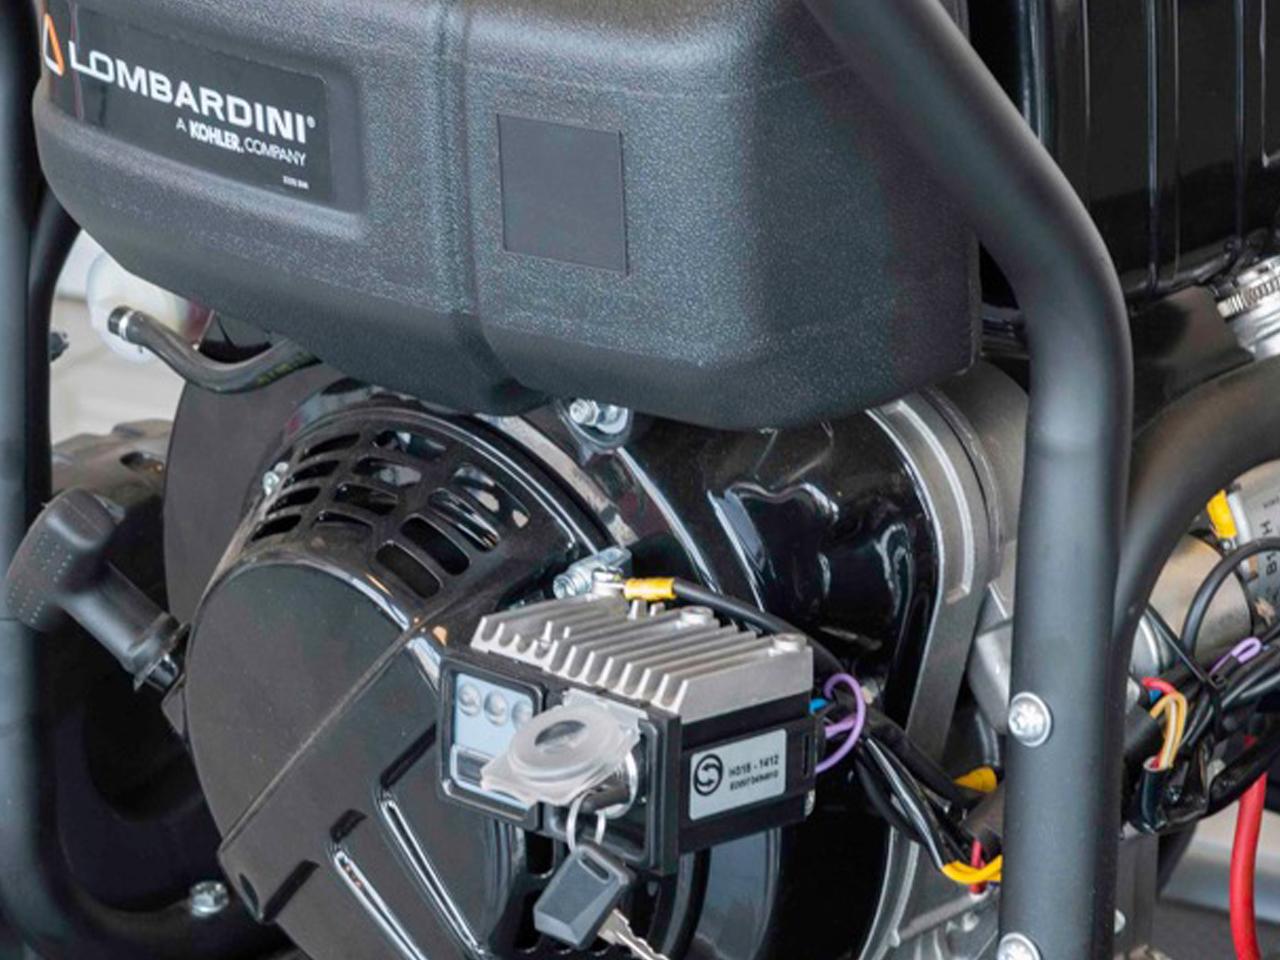 IDROPULITRICI AD ACQUA FREDDA CON MOTORI A COMBUSTIONE INTERNA COLD WATER HIGH-PRESSURE CLEANERS 8.jpg